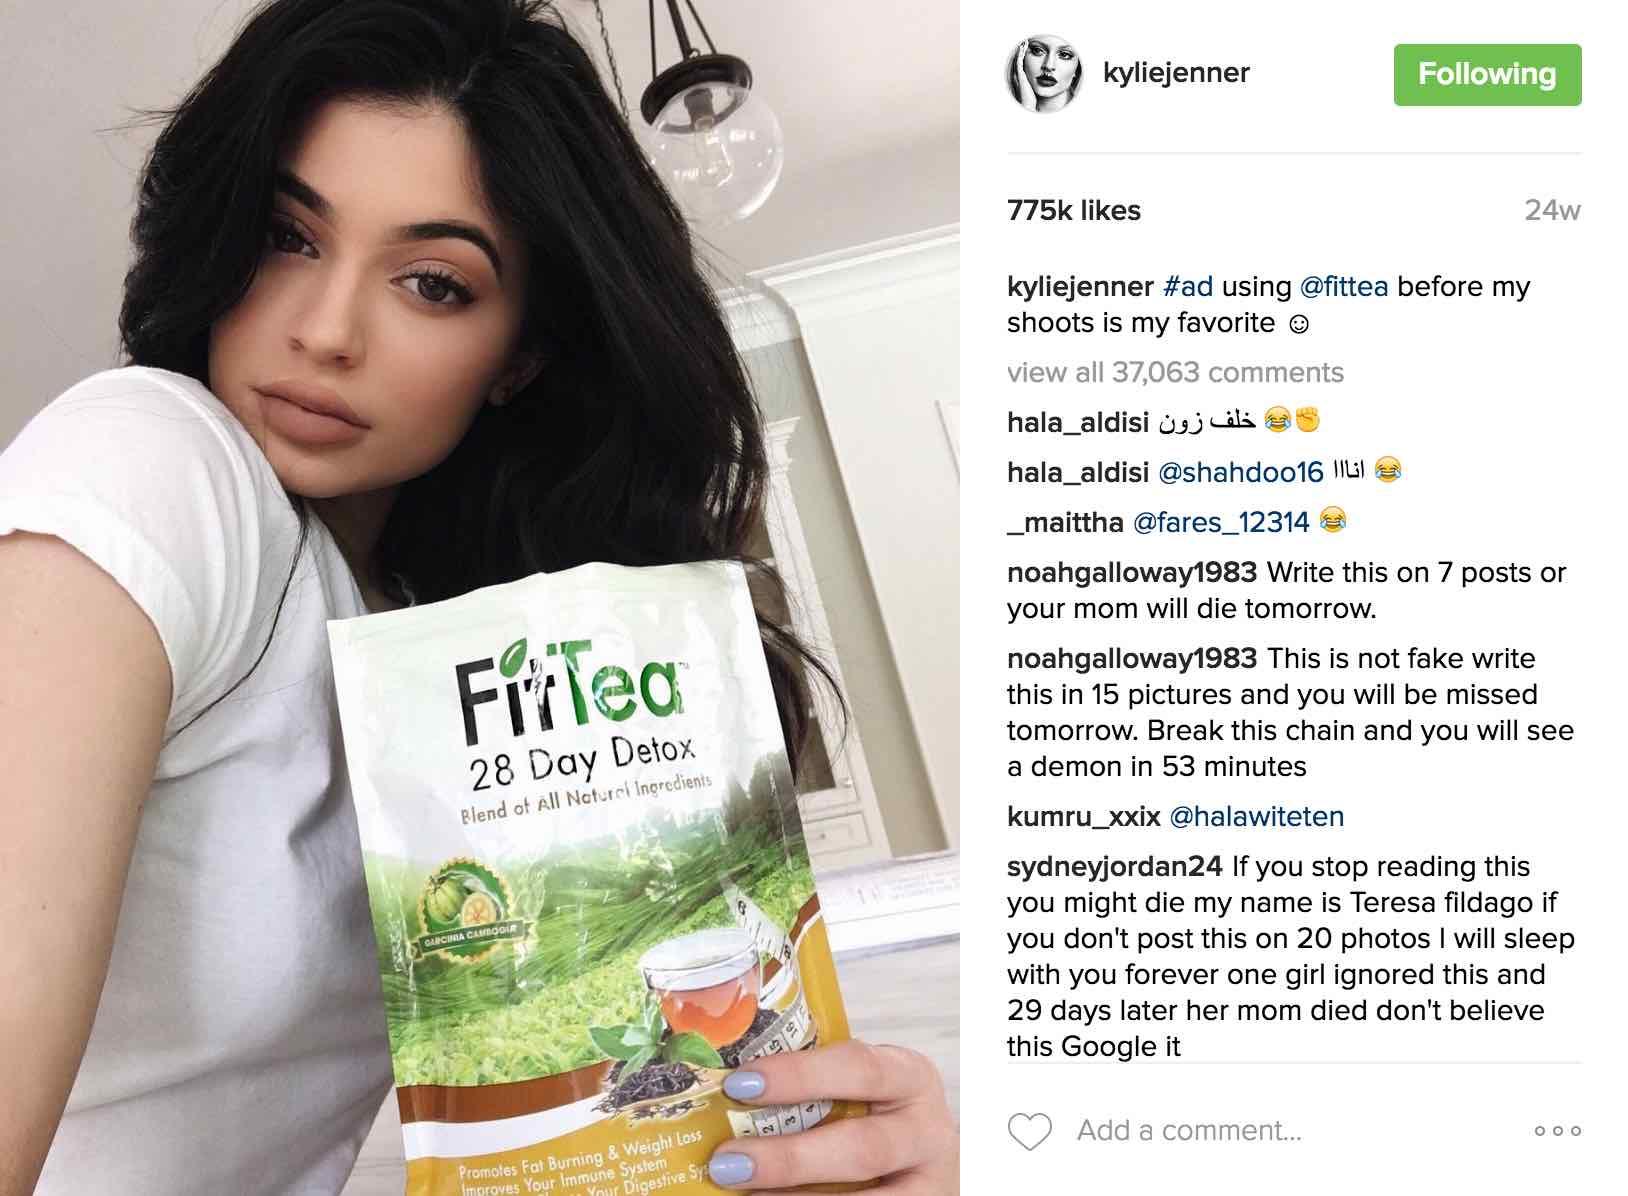 Influencer Marketing_Kylie Jenner